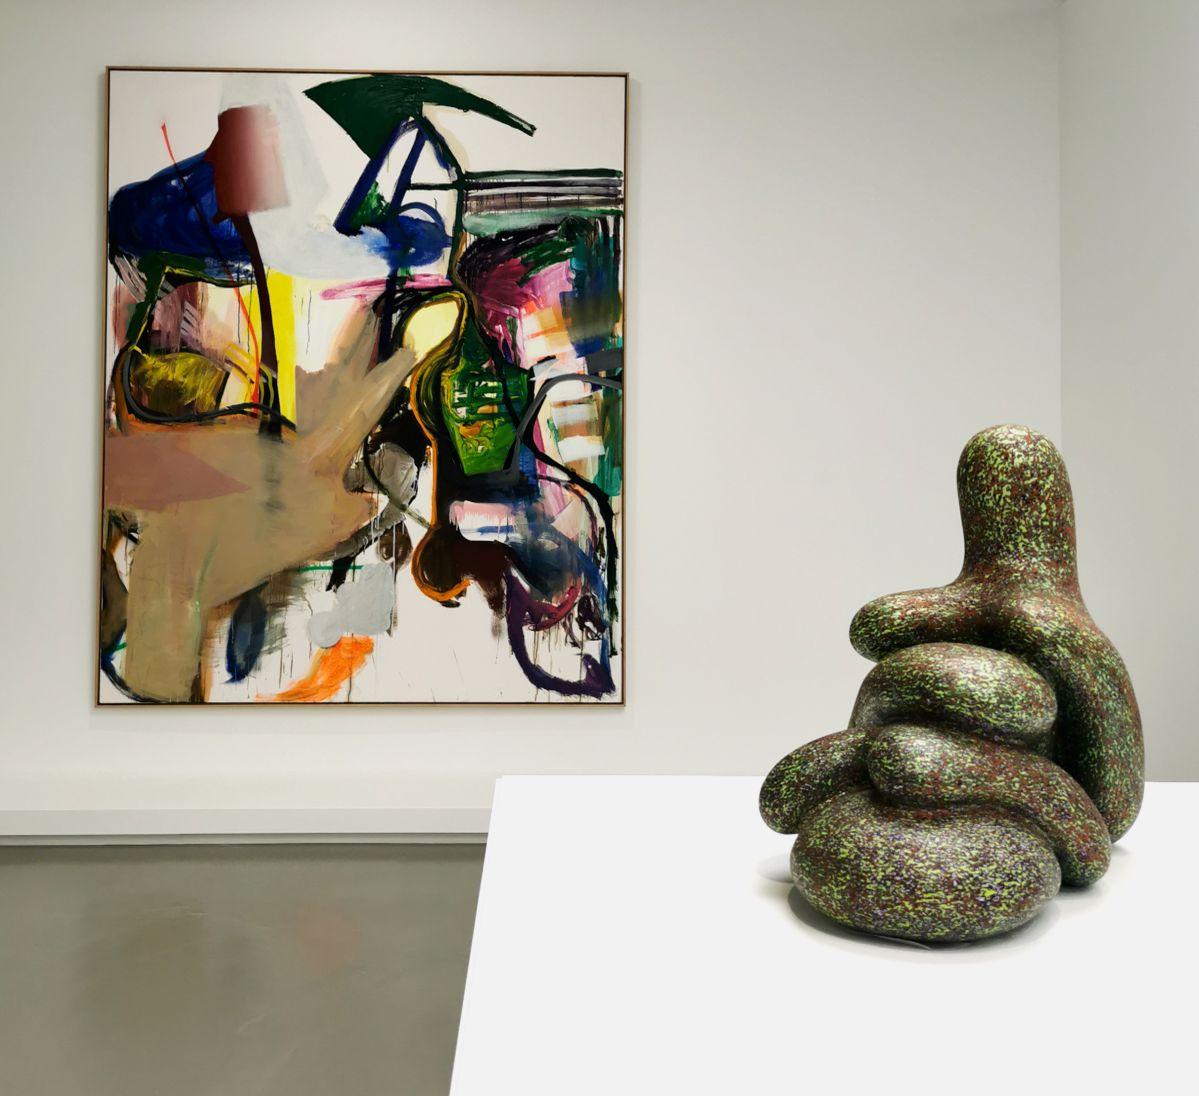 Albert Oehlen - 3 Amigos I, 2000-2006 et Ken Price - Lazo, 2006 - 00s - Collection Cranford - les années 2000 au MOCO Montpellier